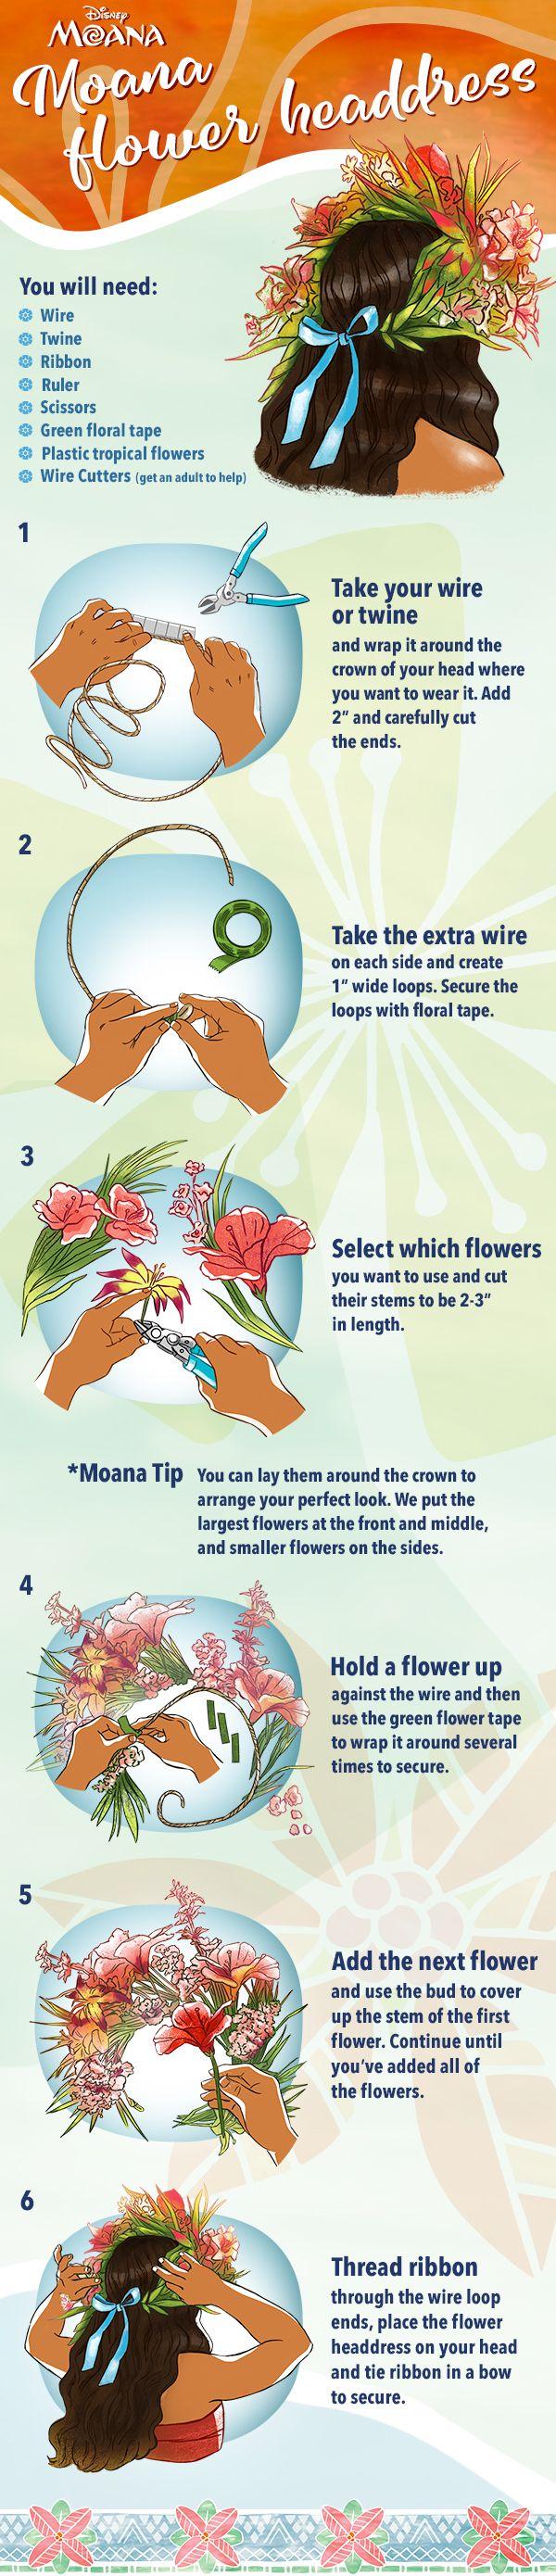 Create Your Own Diy Flower Headdress Bring Disneys Moana Home To